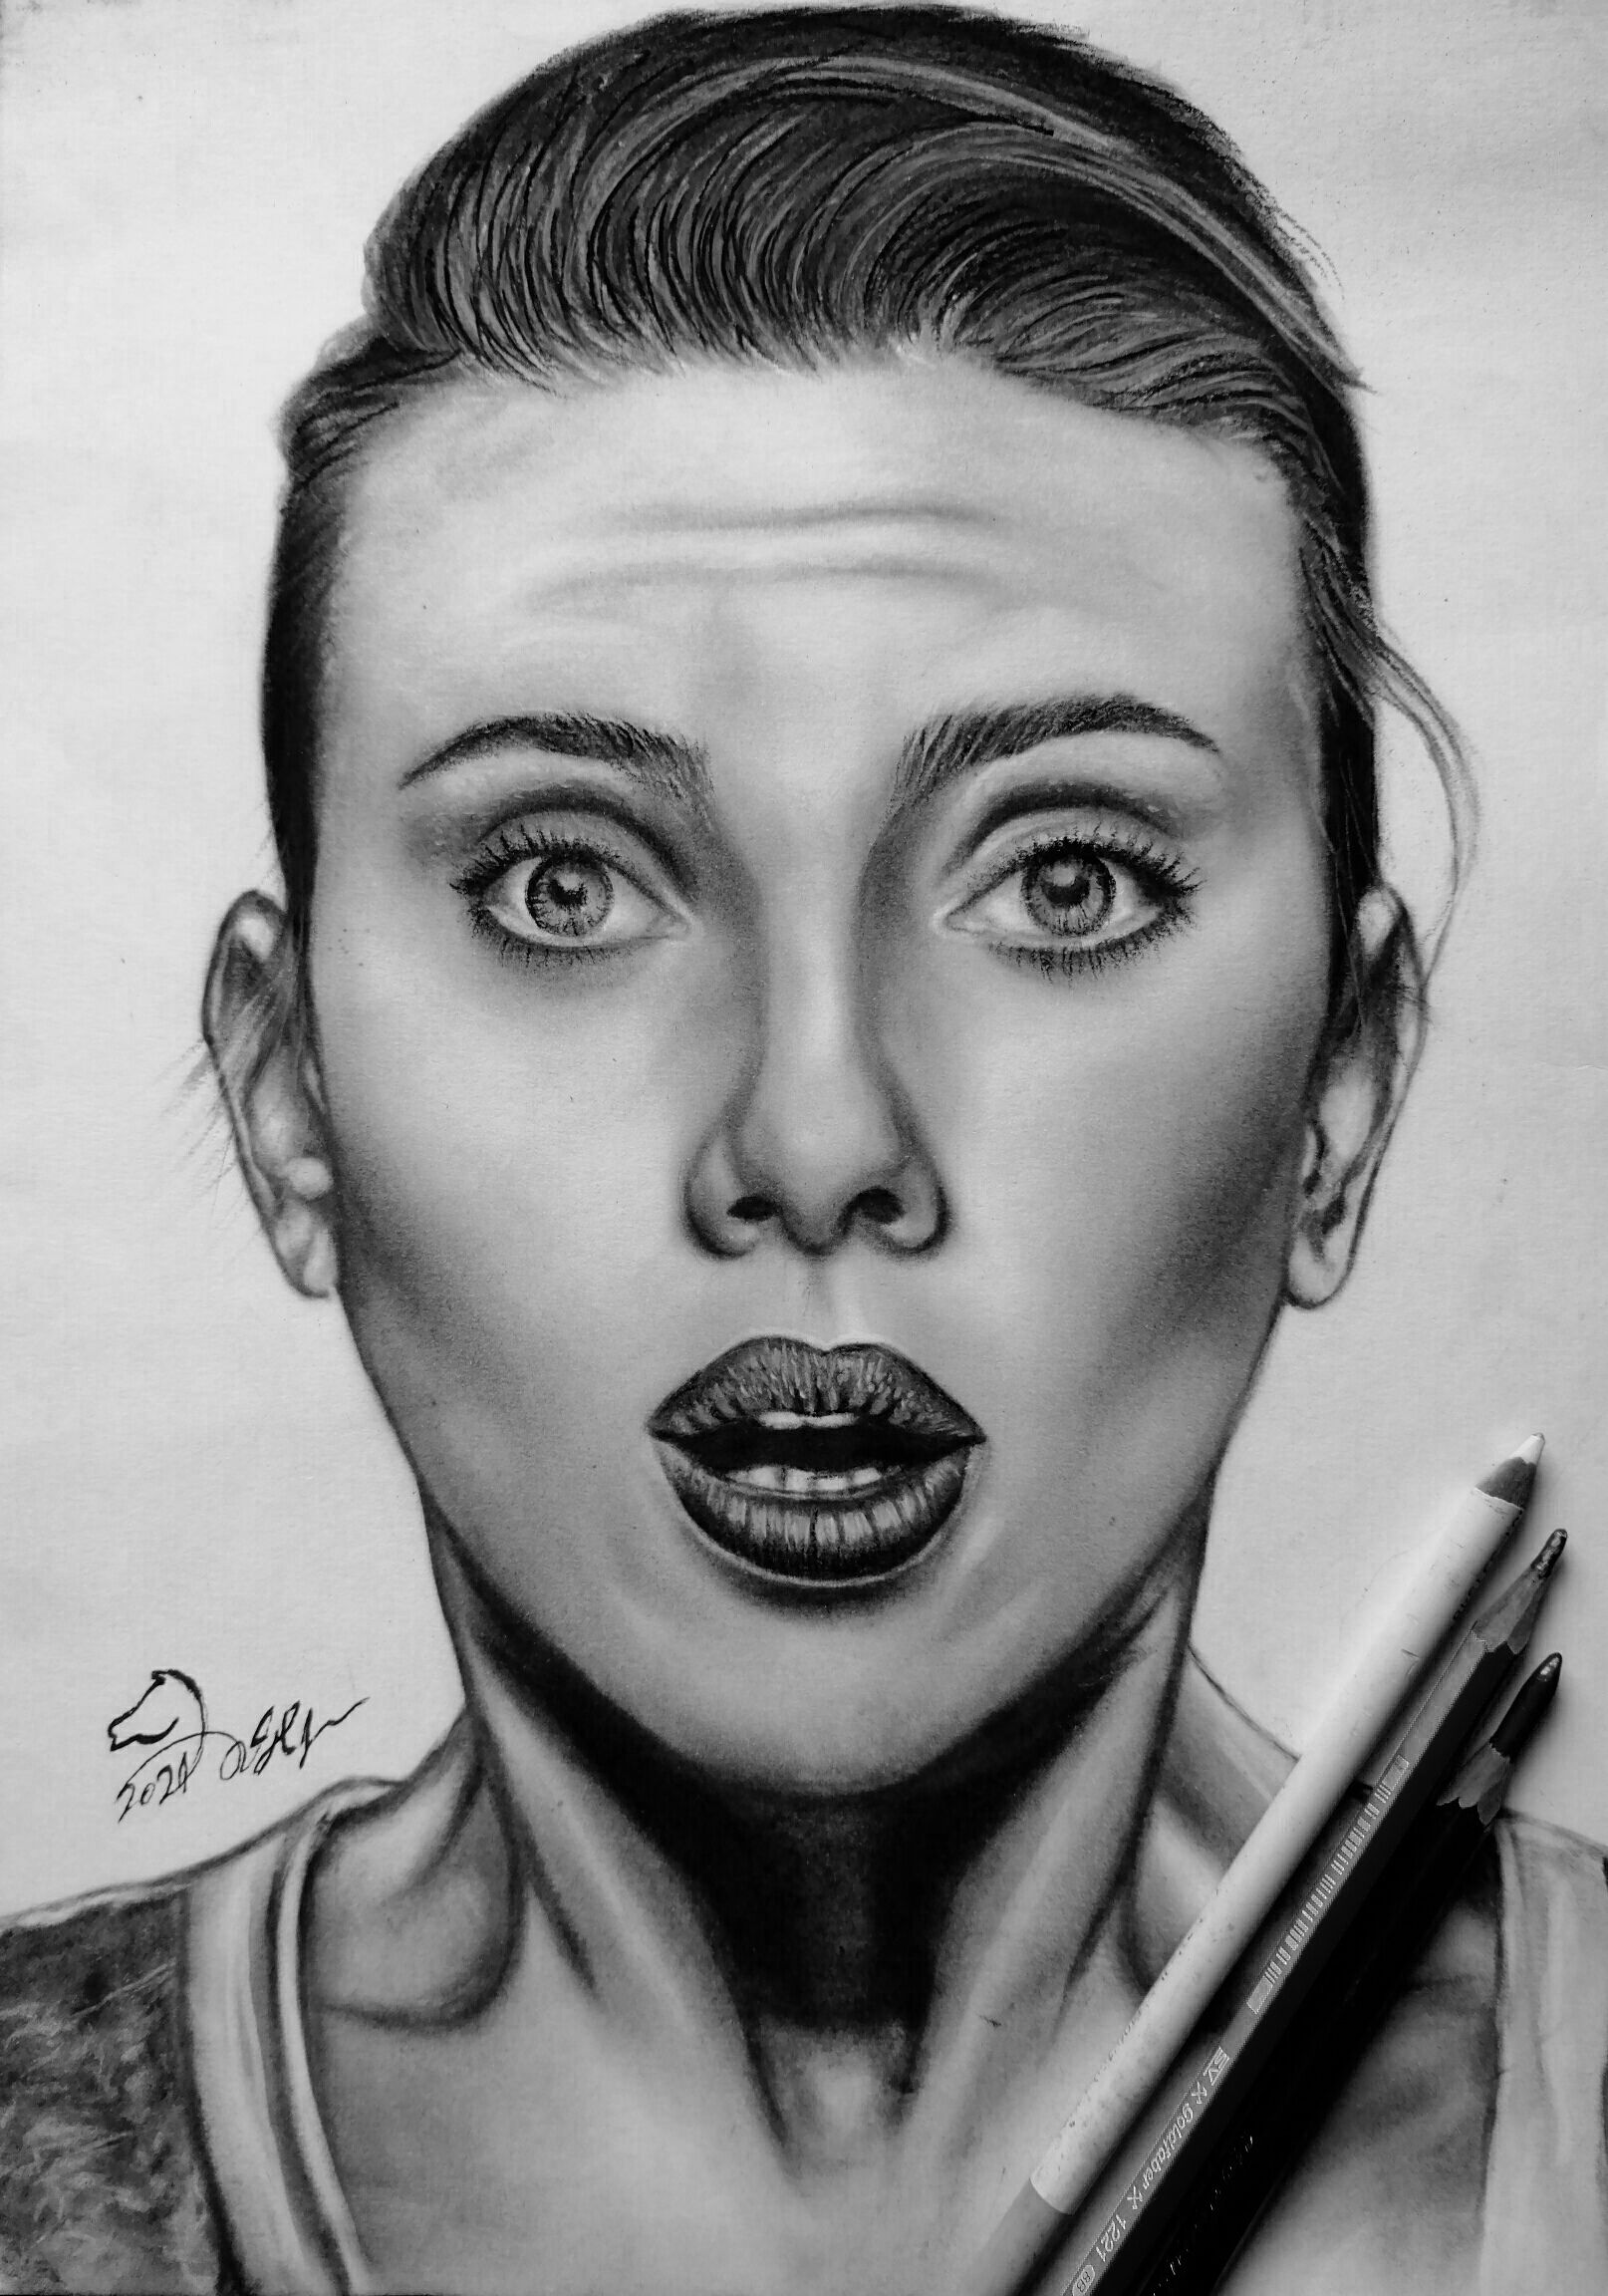 Scarlett Johansson Portrait Drawing رسم سكارليت جوهانسون بالفحم In 2021 Portrait Drawing Portrait Drawings